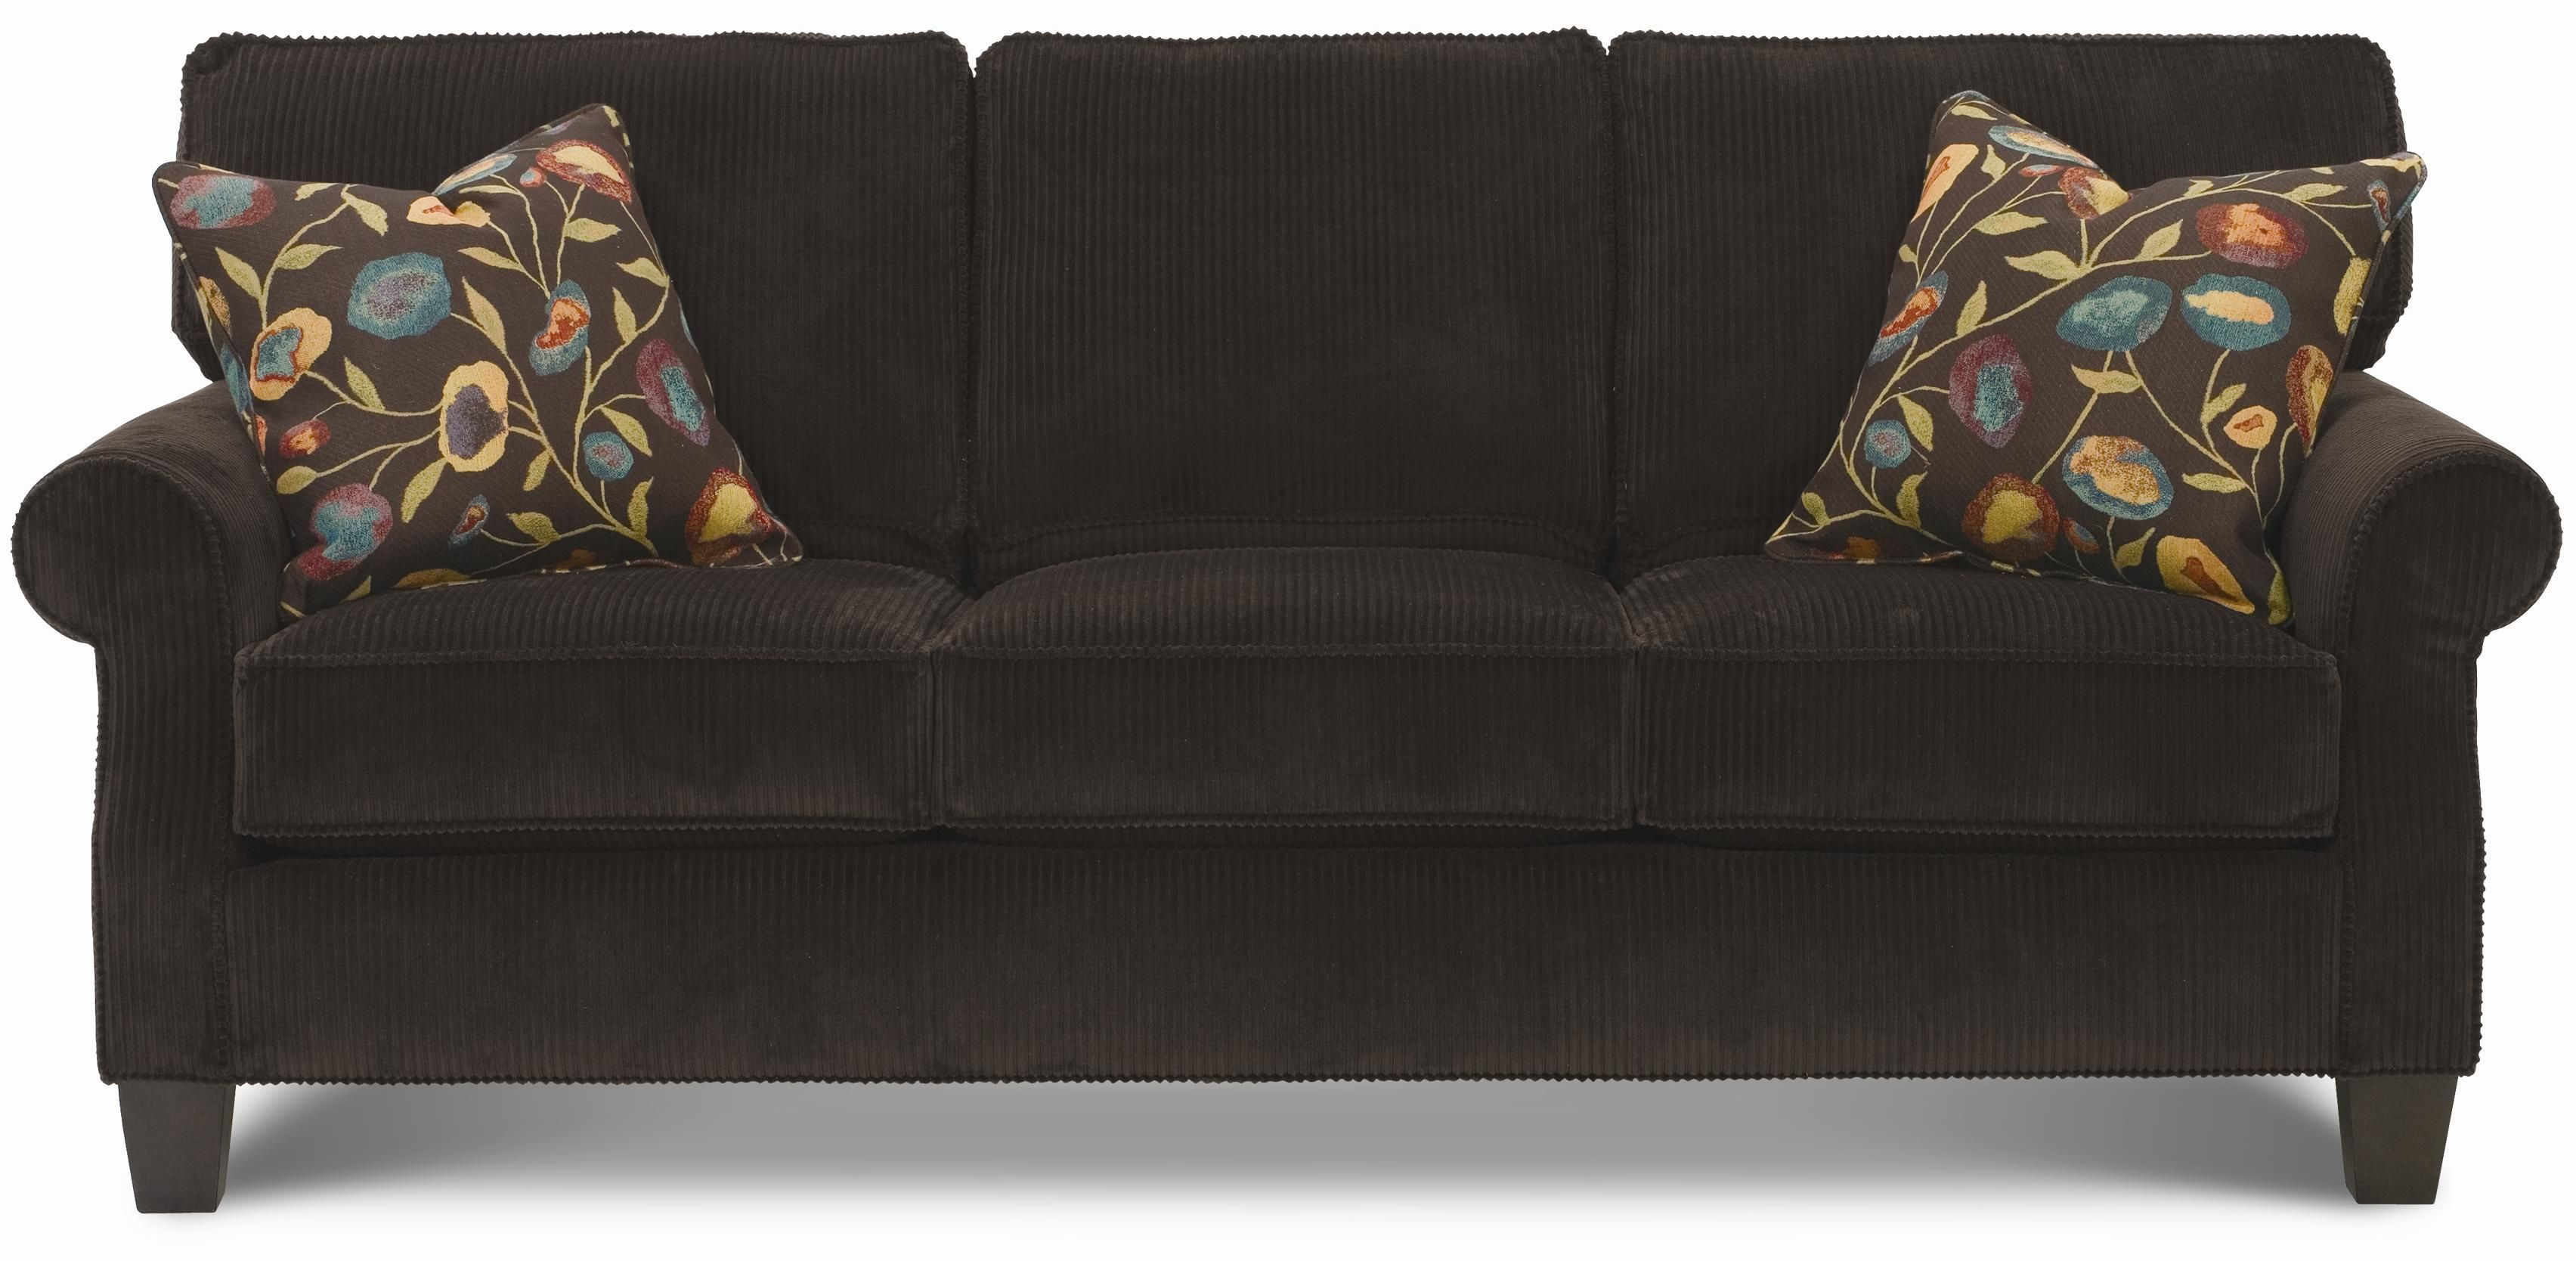 Fabric Z1015910 Grey (pillow), Sofa N1974710 Grey